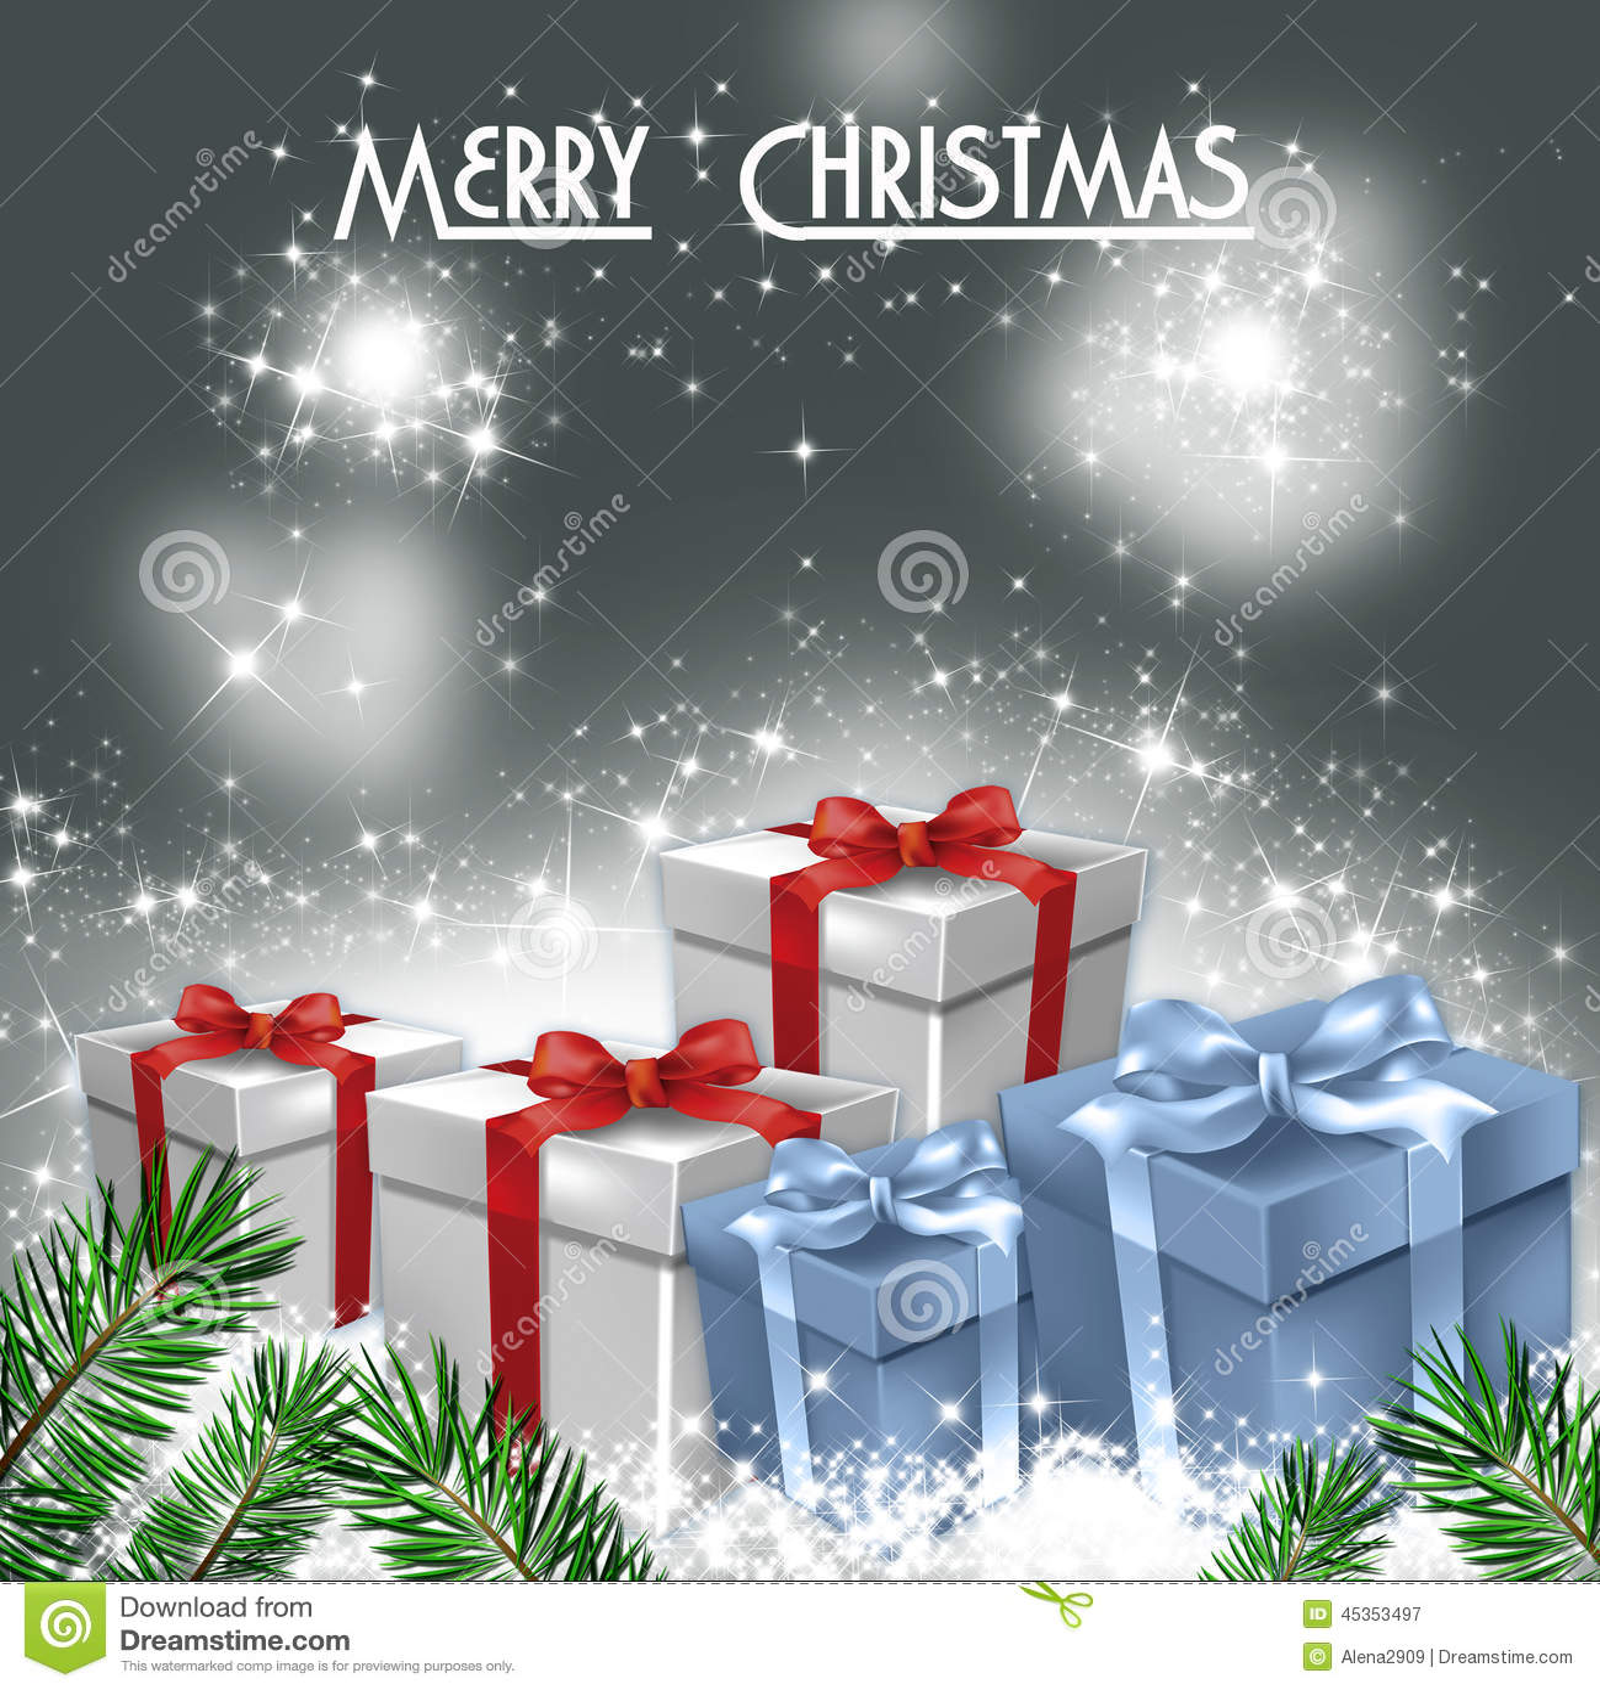 Cardez la salutation de Noël